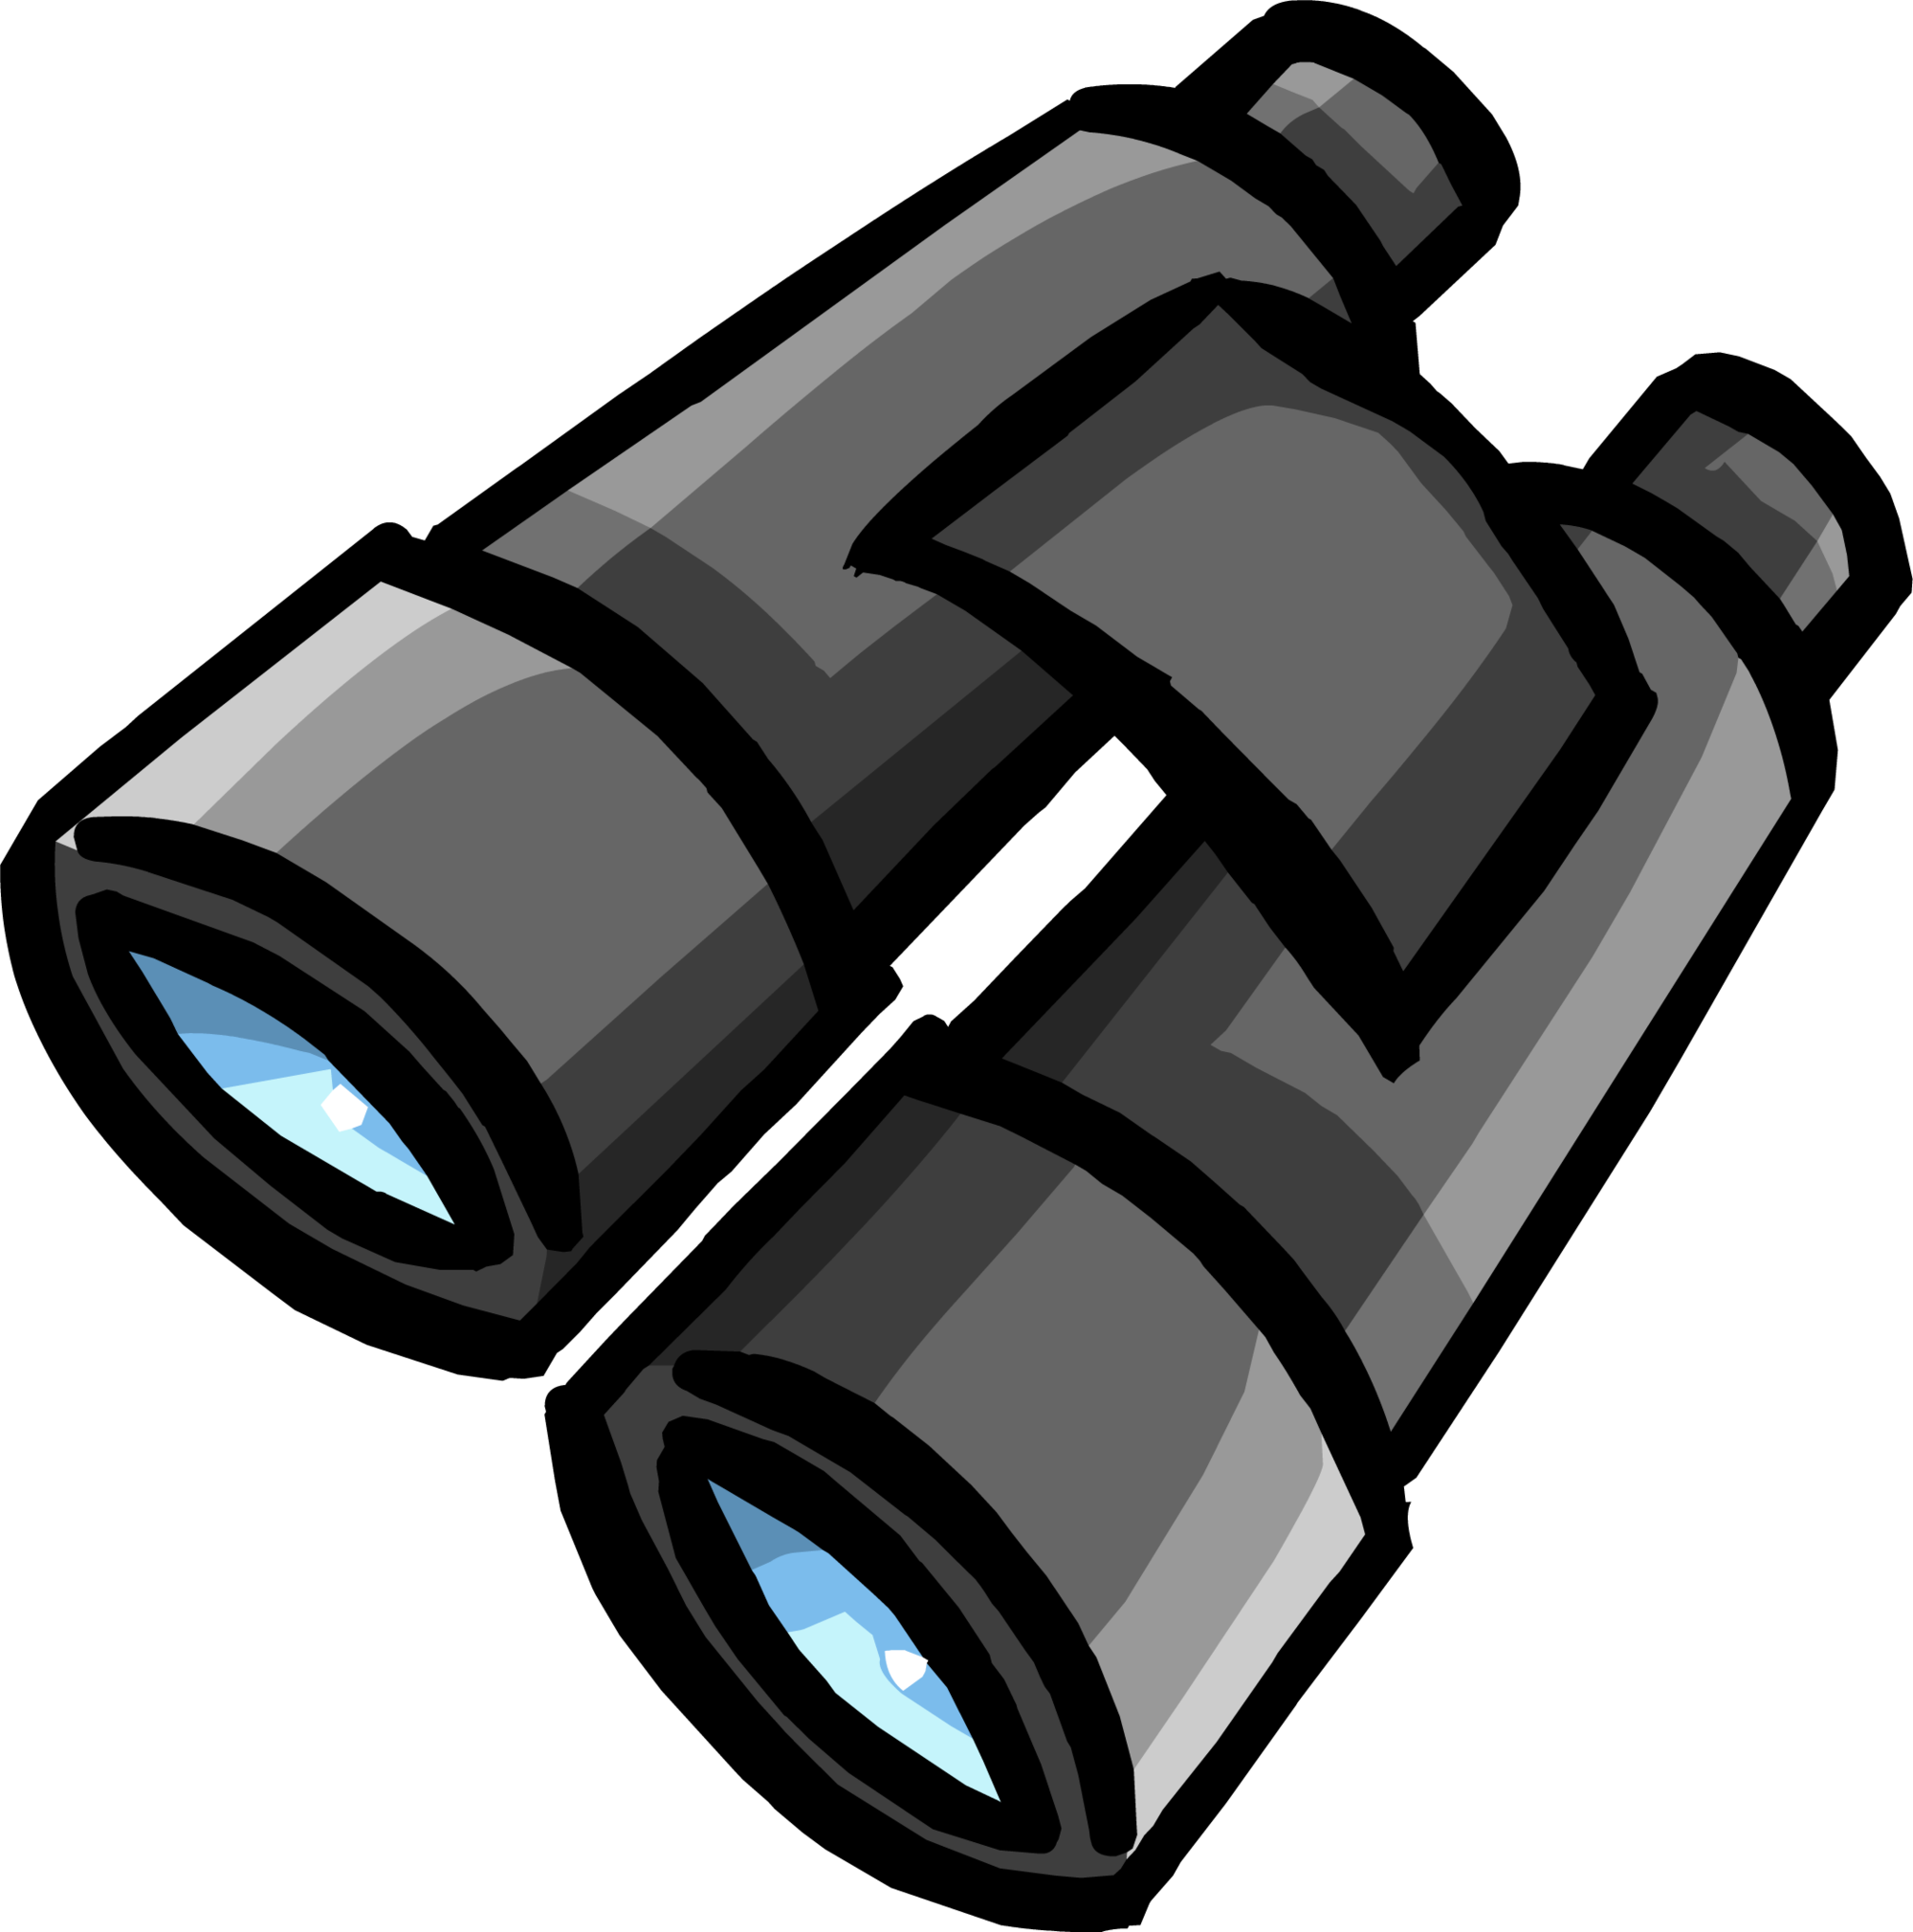 clipart transparent library Image binoculars png club. Binocular clipart